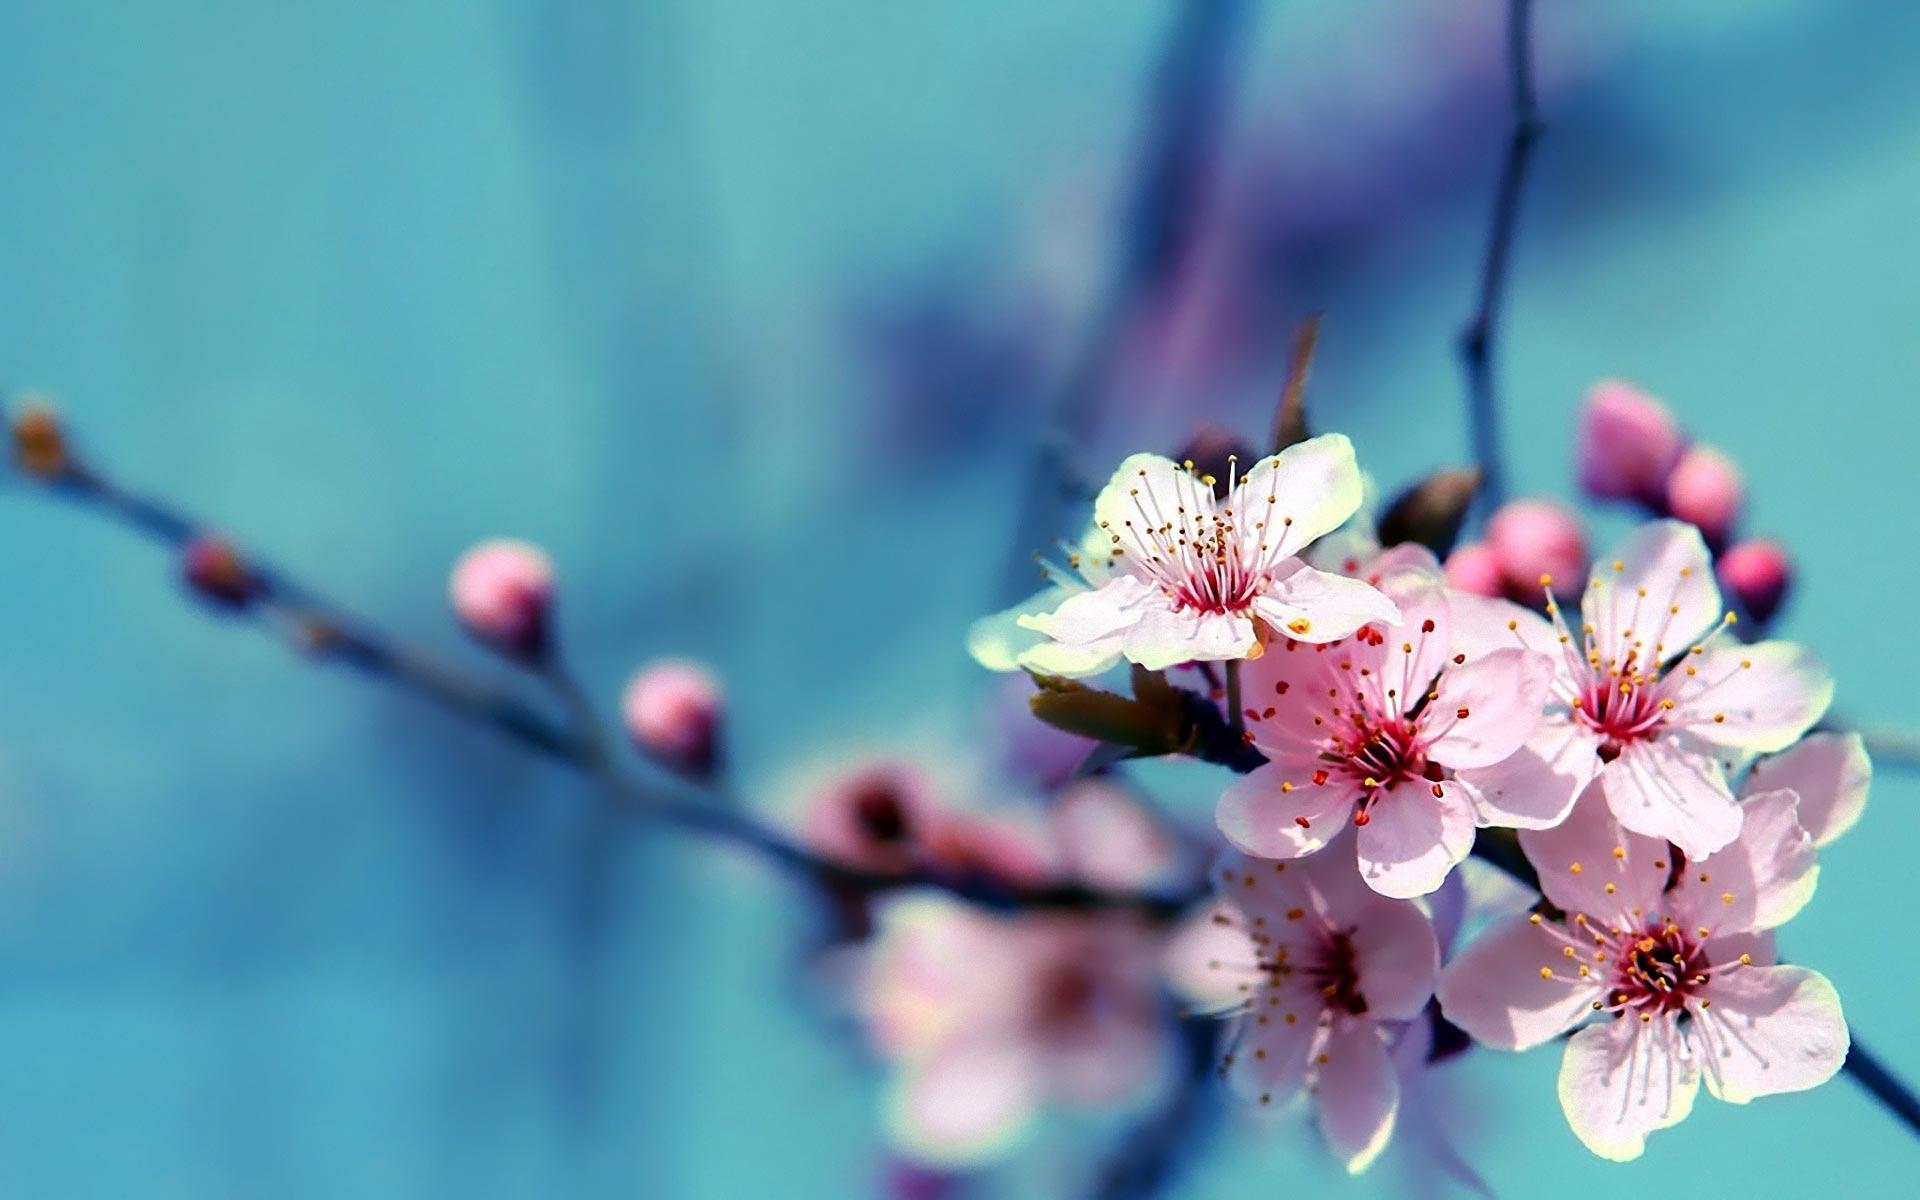 Beautiful-Free-HD-Flower-DesignMaz-wallpaper-wpc9002699